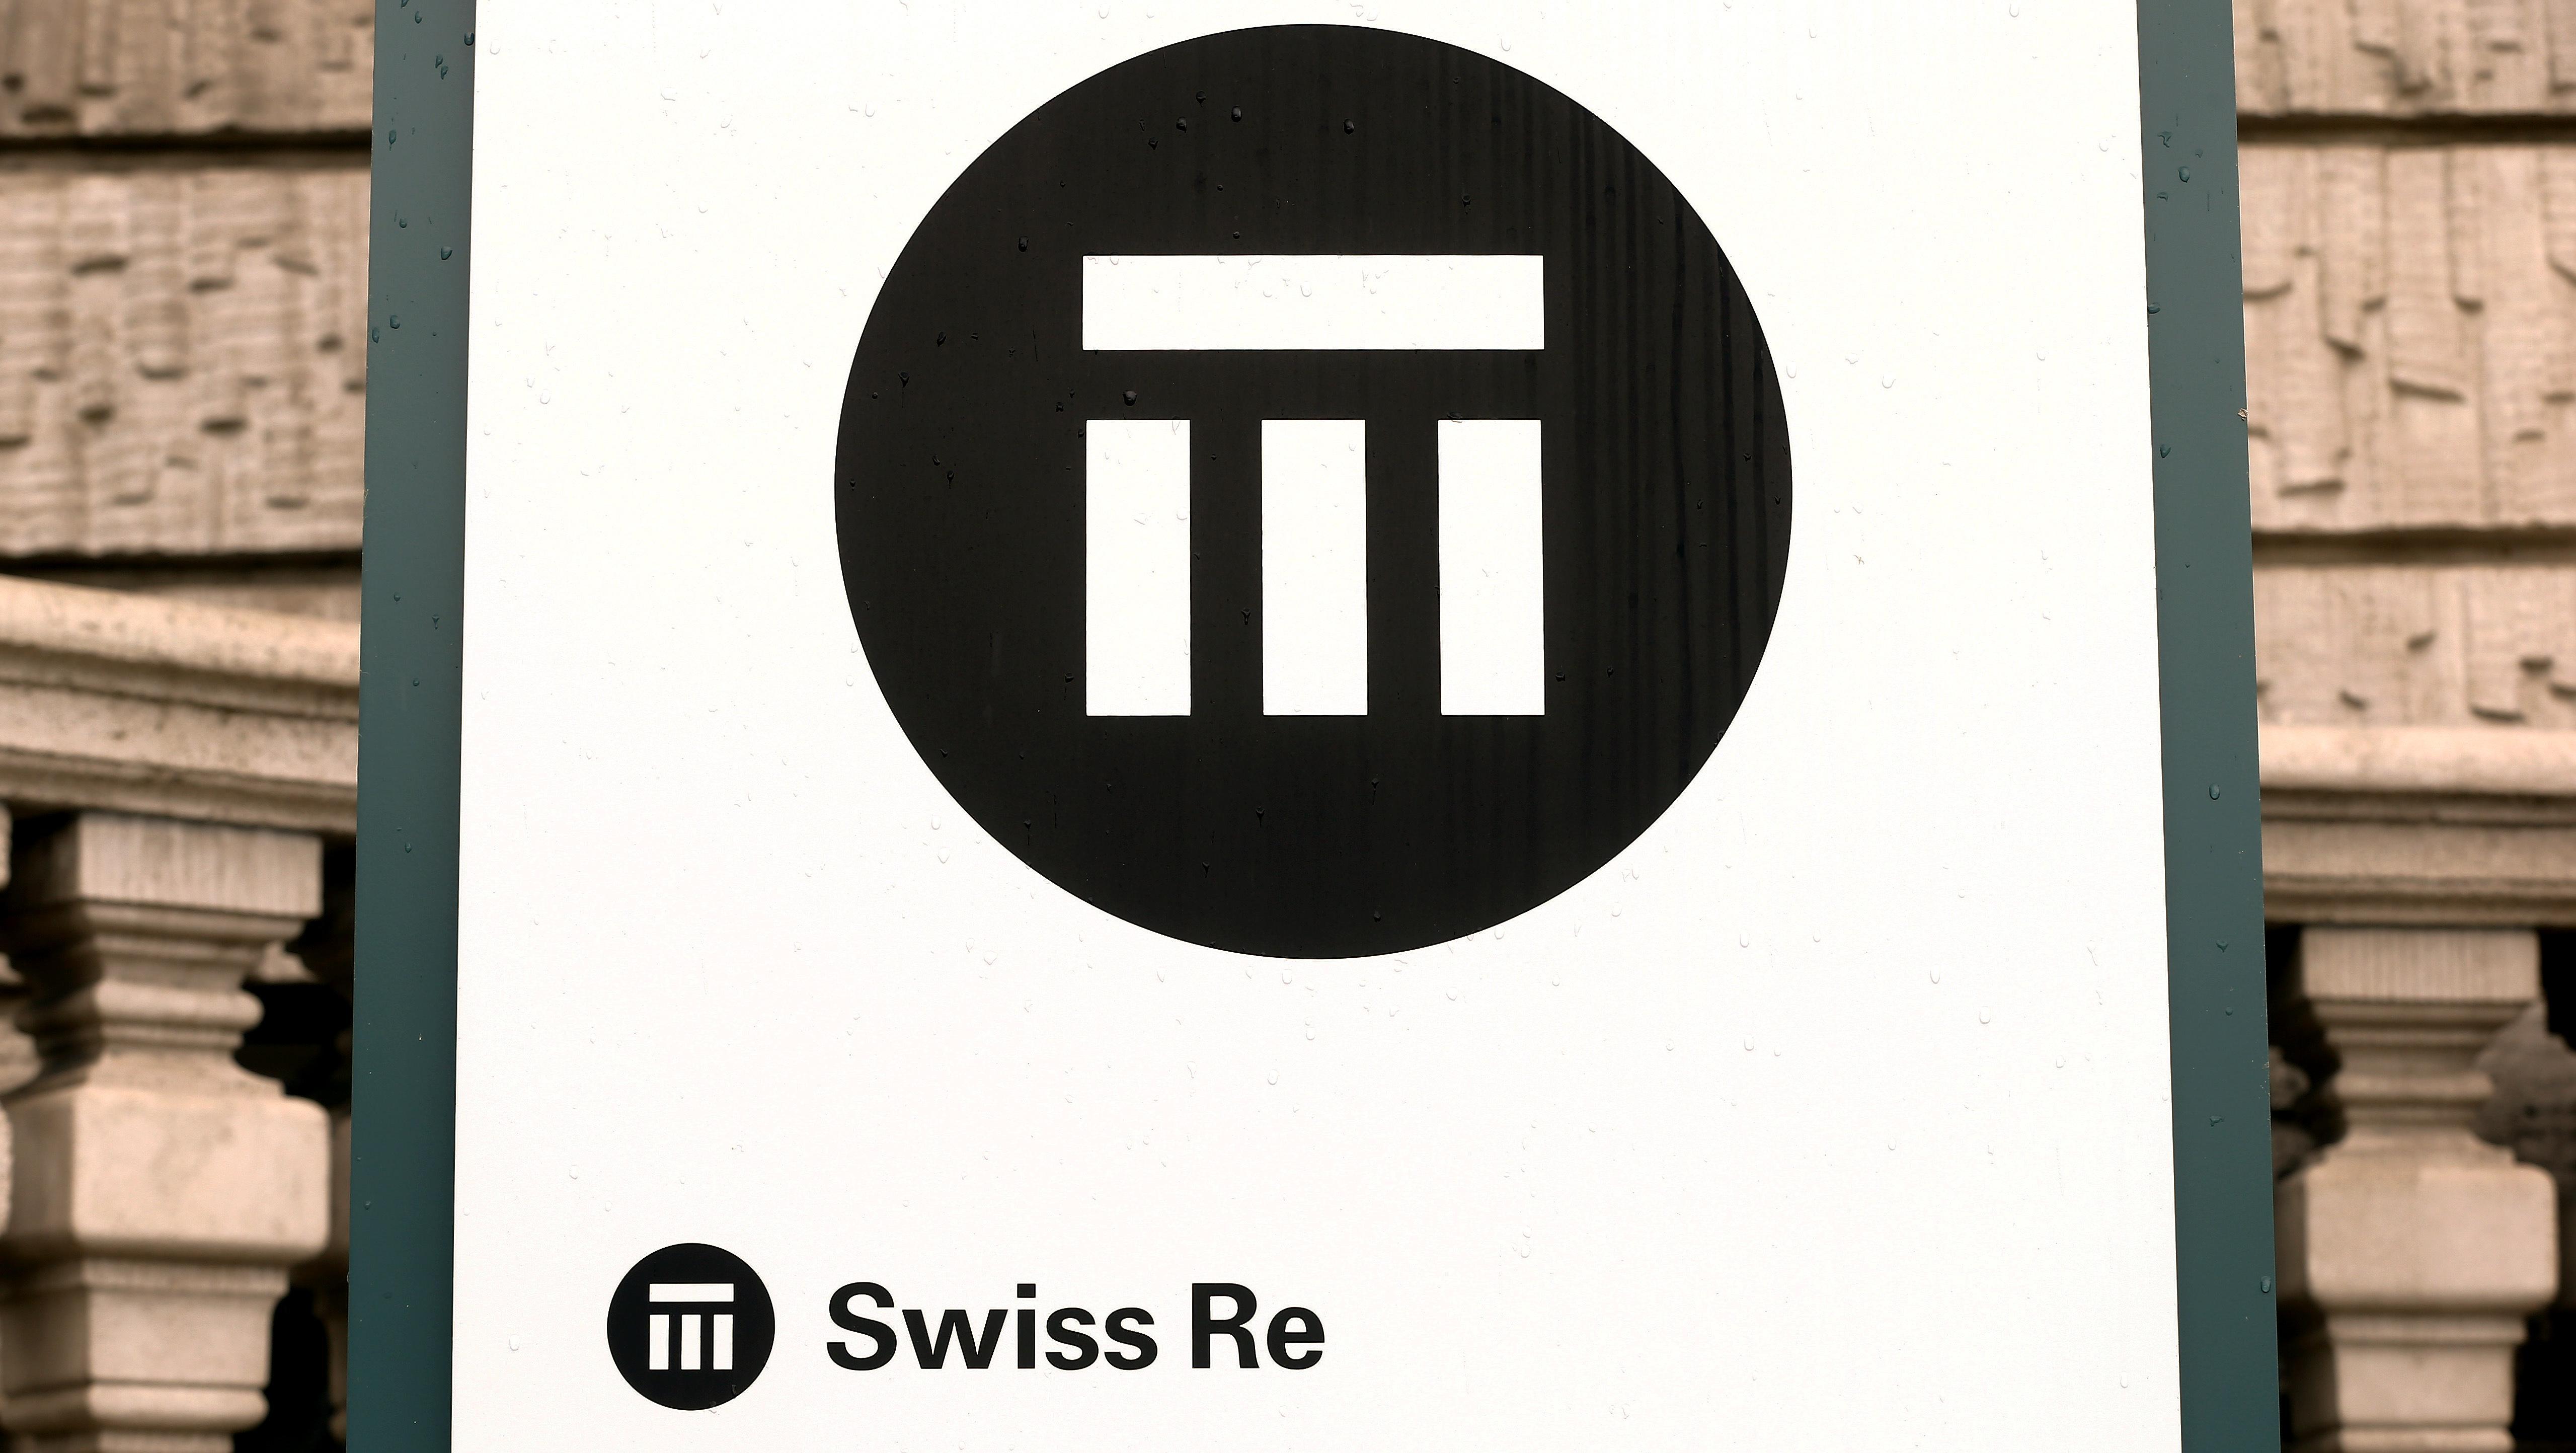 Britain's Phoenix to buy Swiss Re's ReAssure business for $4.1 billion